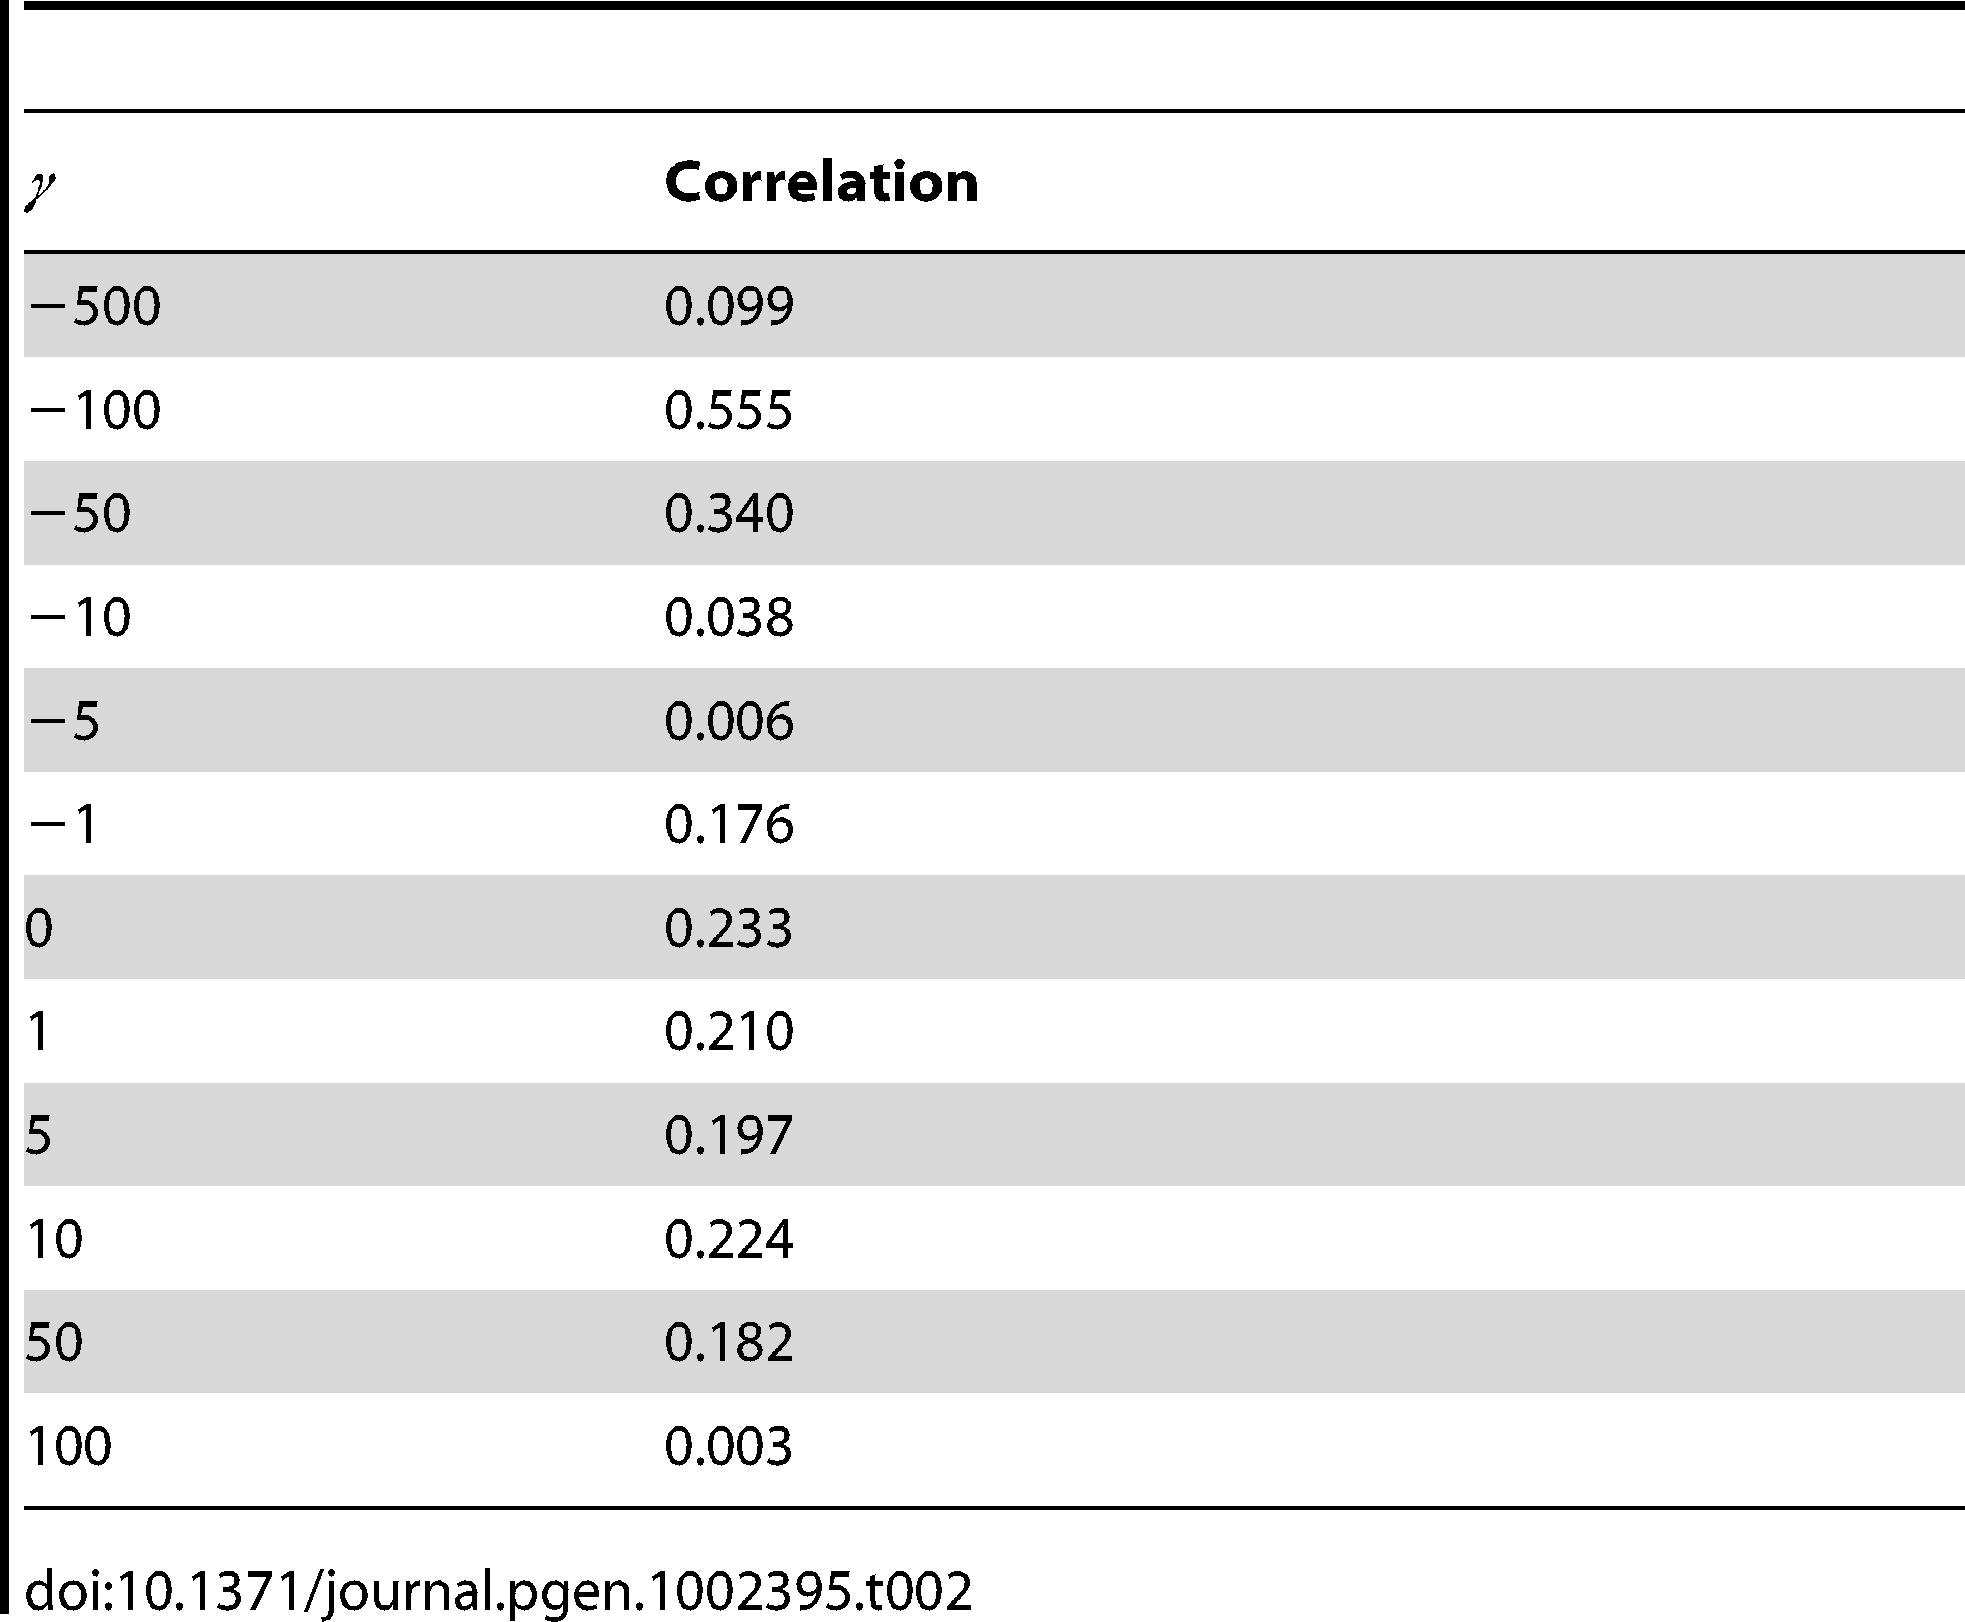 Correlation in selection coefficient probability between <i>D. melanogaster</i> and <i>D. simulans</i>.